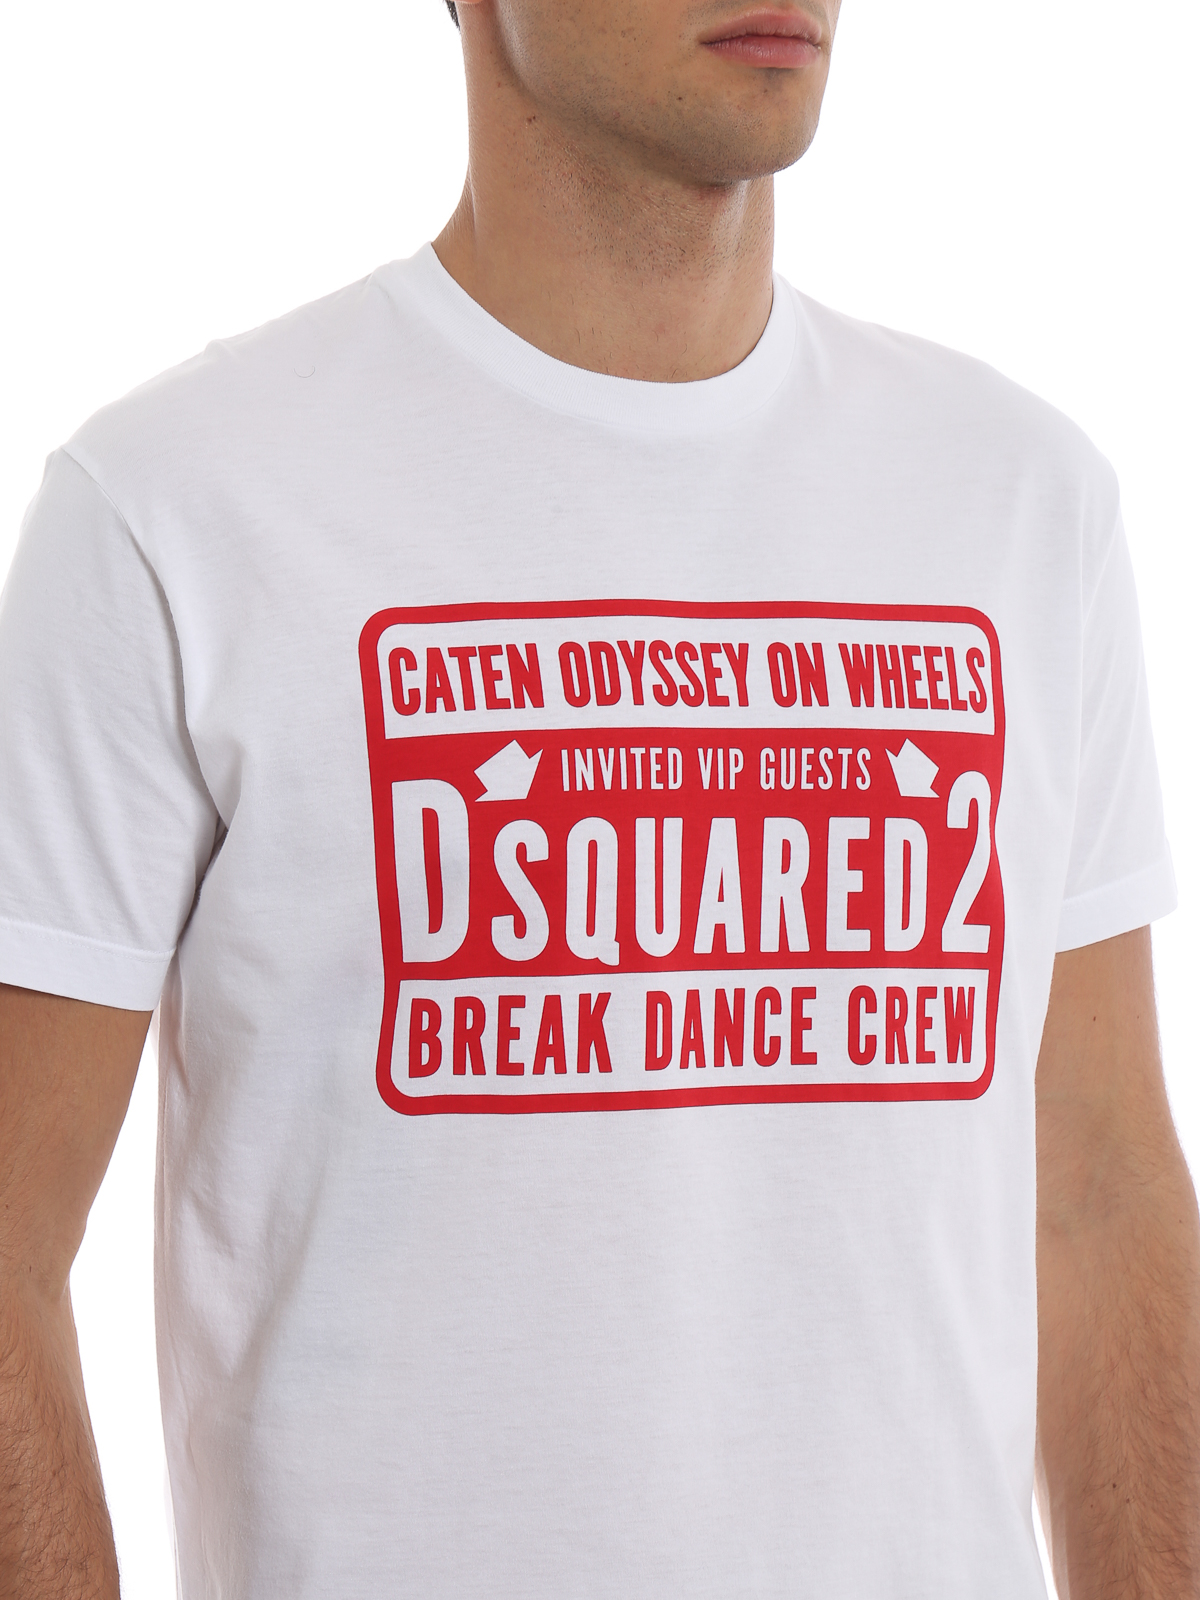 5492f9b92a1d1 Dsquared2 - Break Dance Crew print T-shirt - t-shirts ...